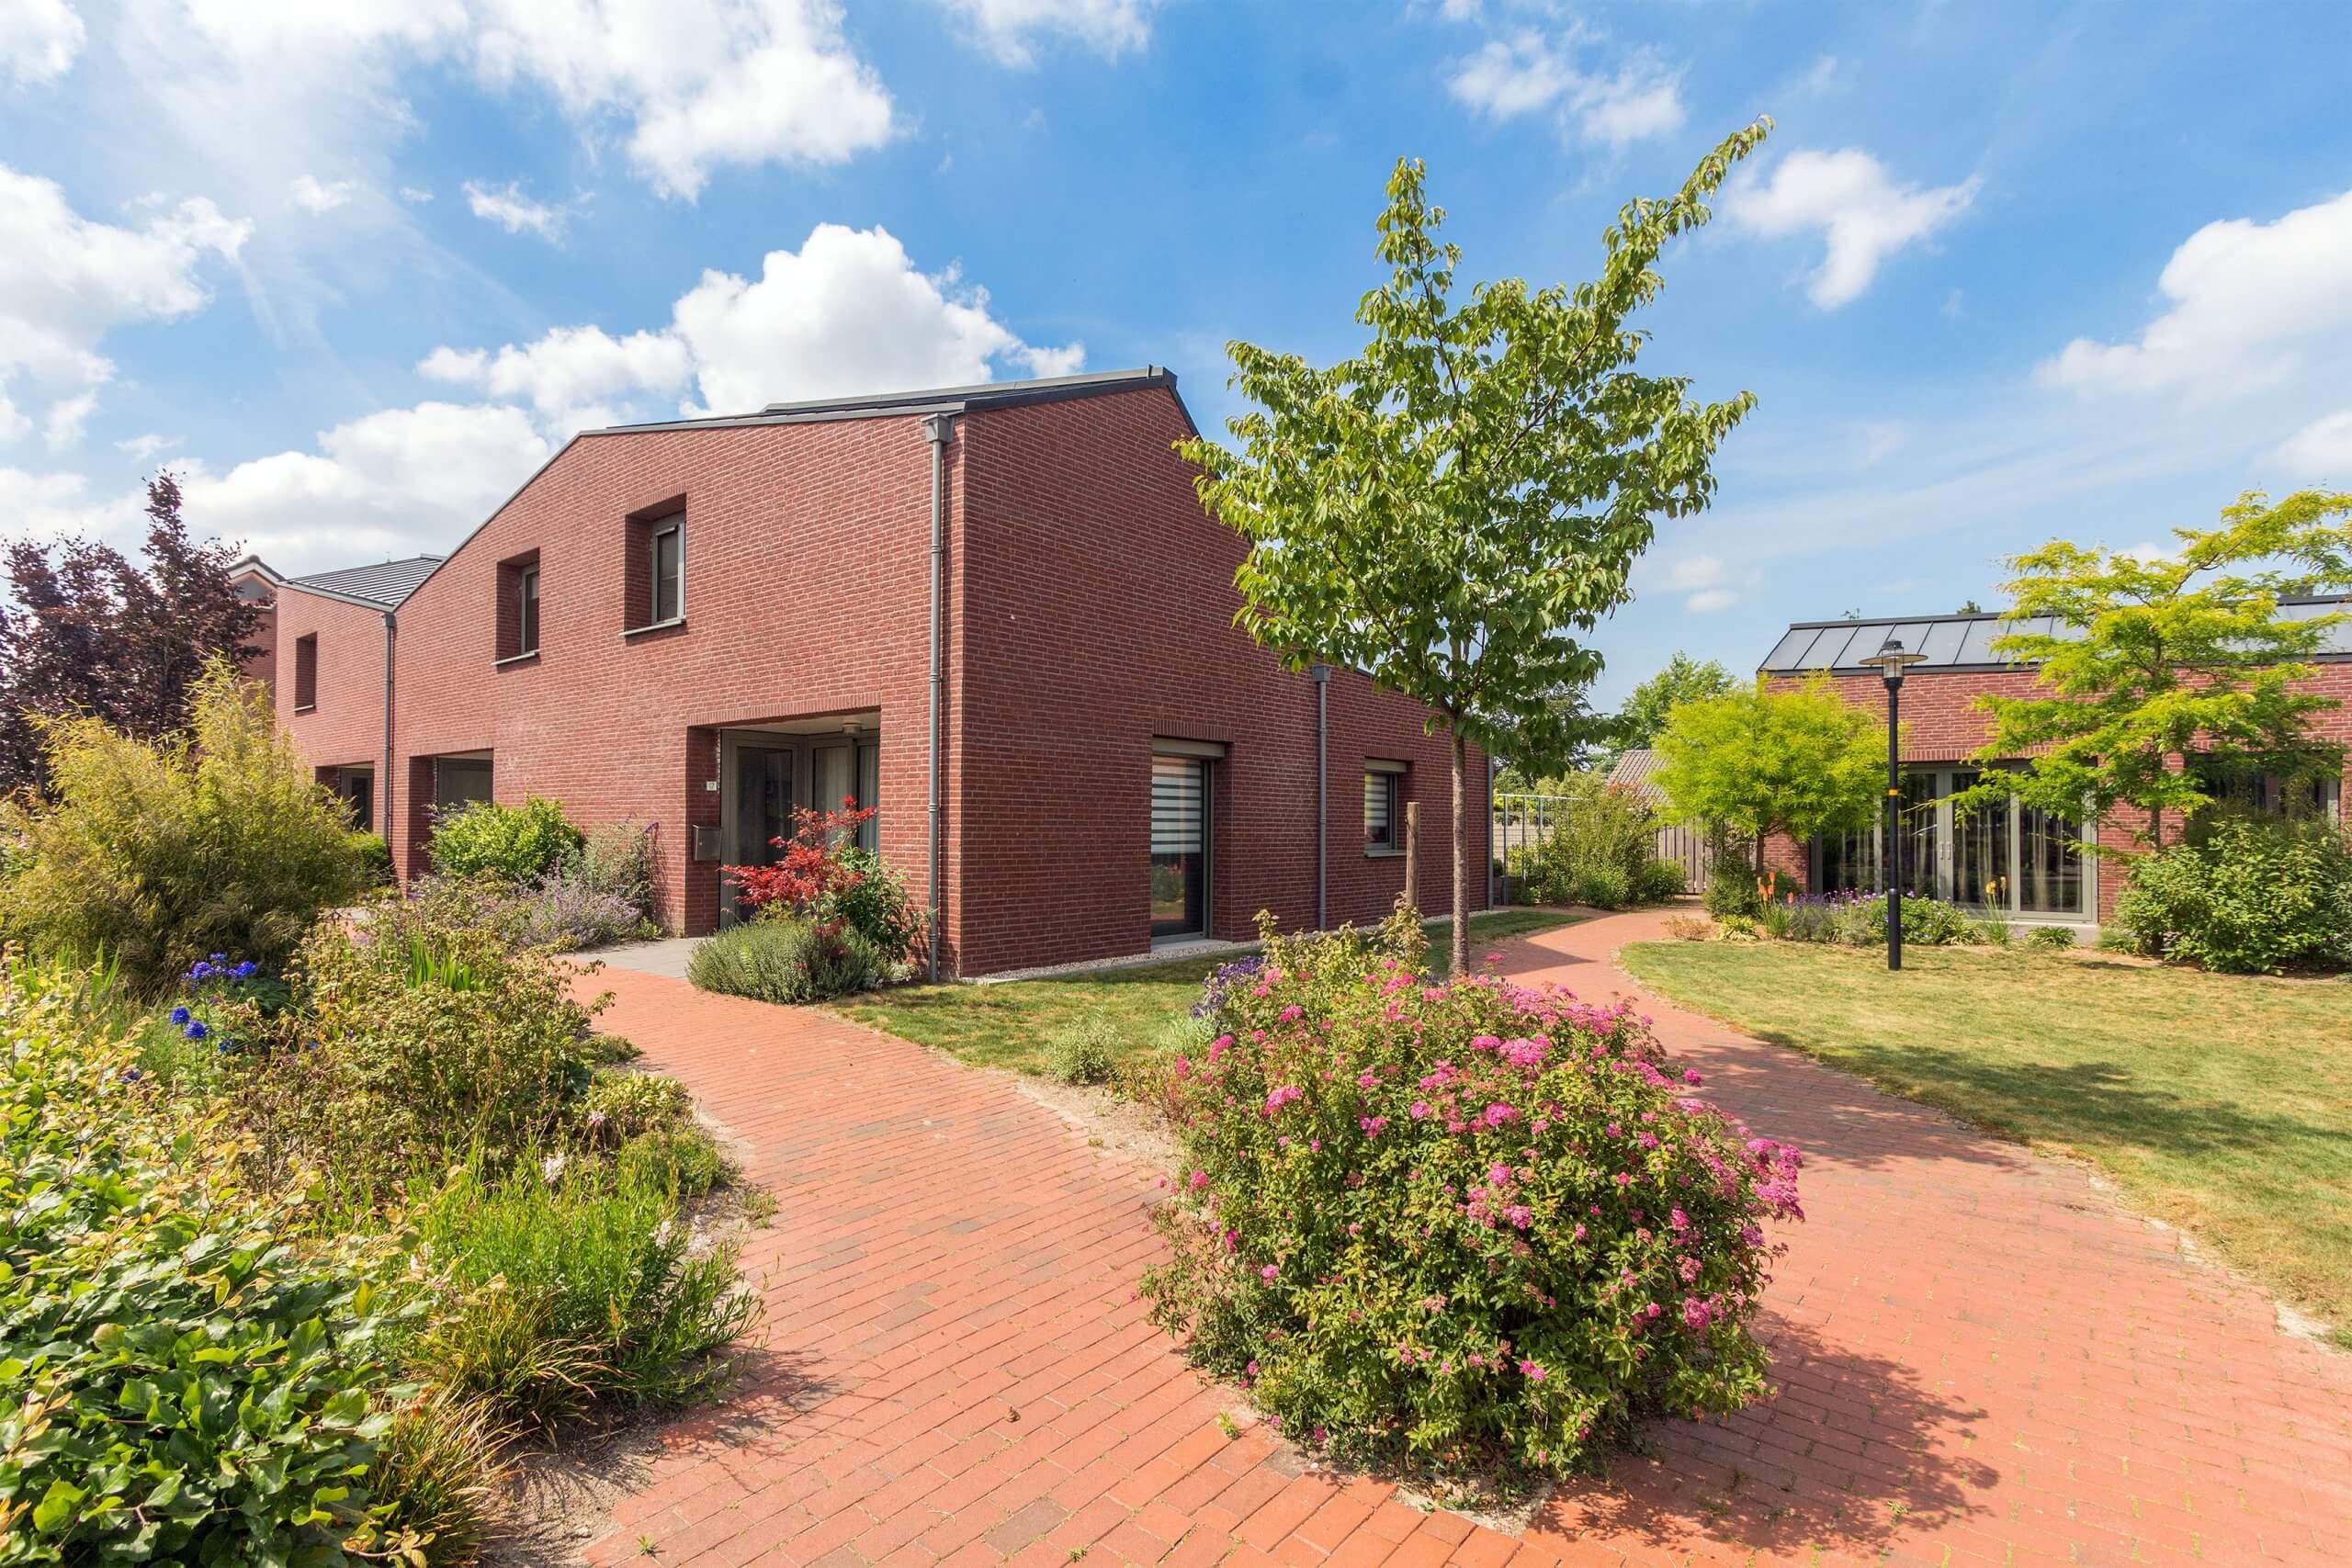 Exterieur van bakstenen senioren woningen in Nederasselt, provincie Gelderland